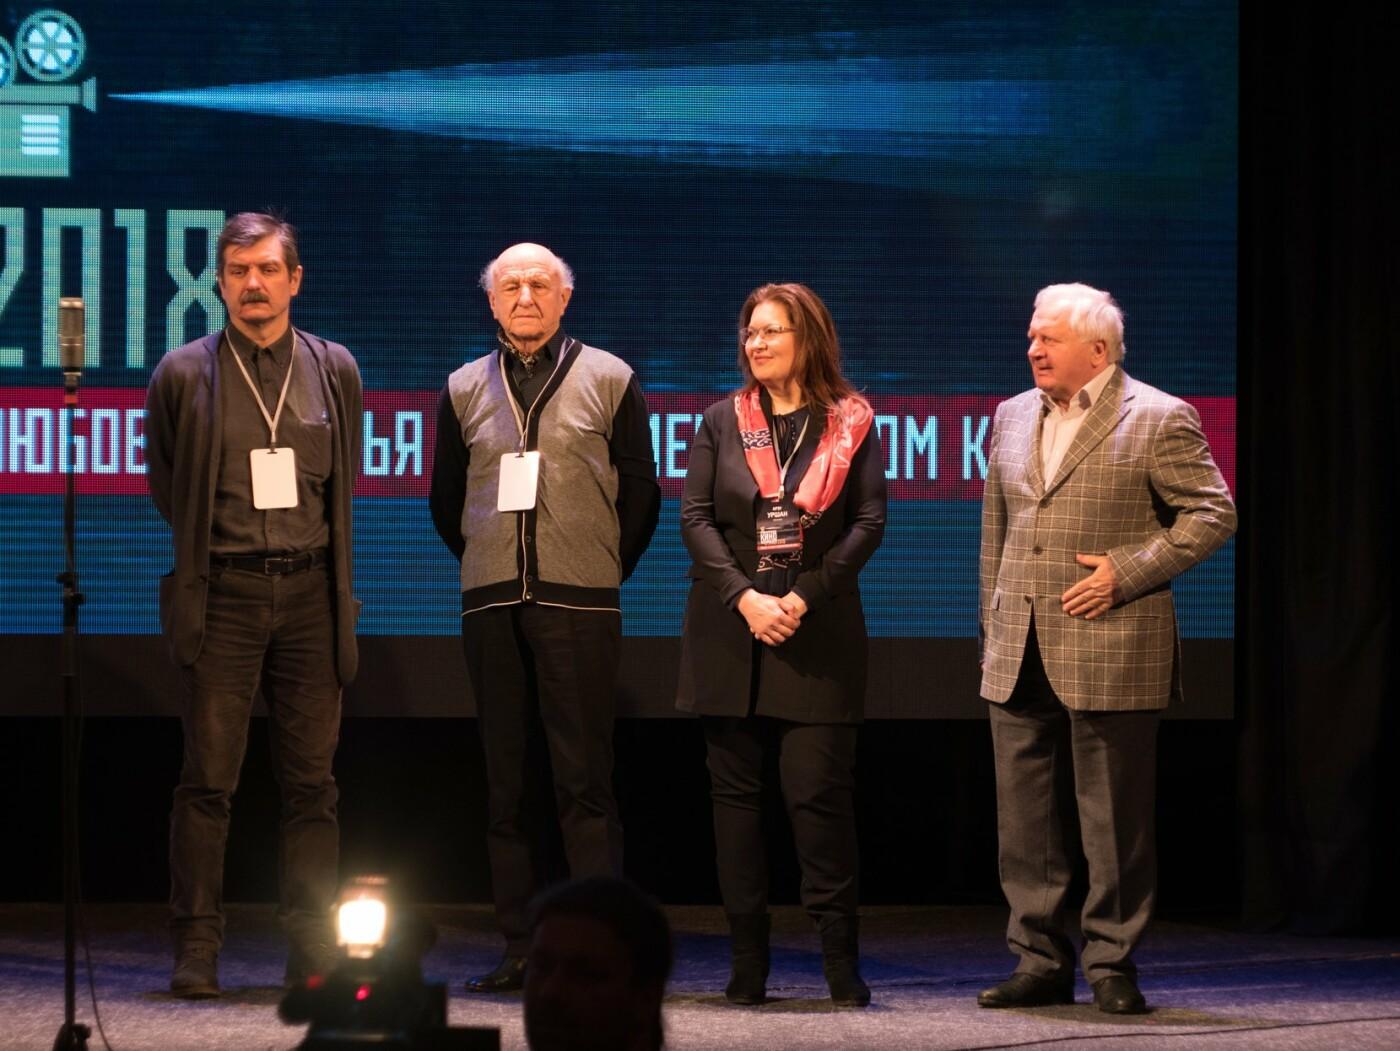 Киноассамблея на Днепре-2018: как прошла церемония открытия кинофорума (ФОТО), фото-7